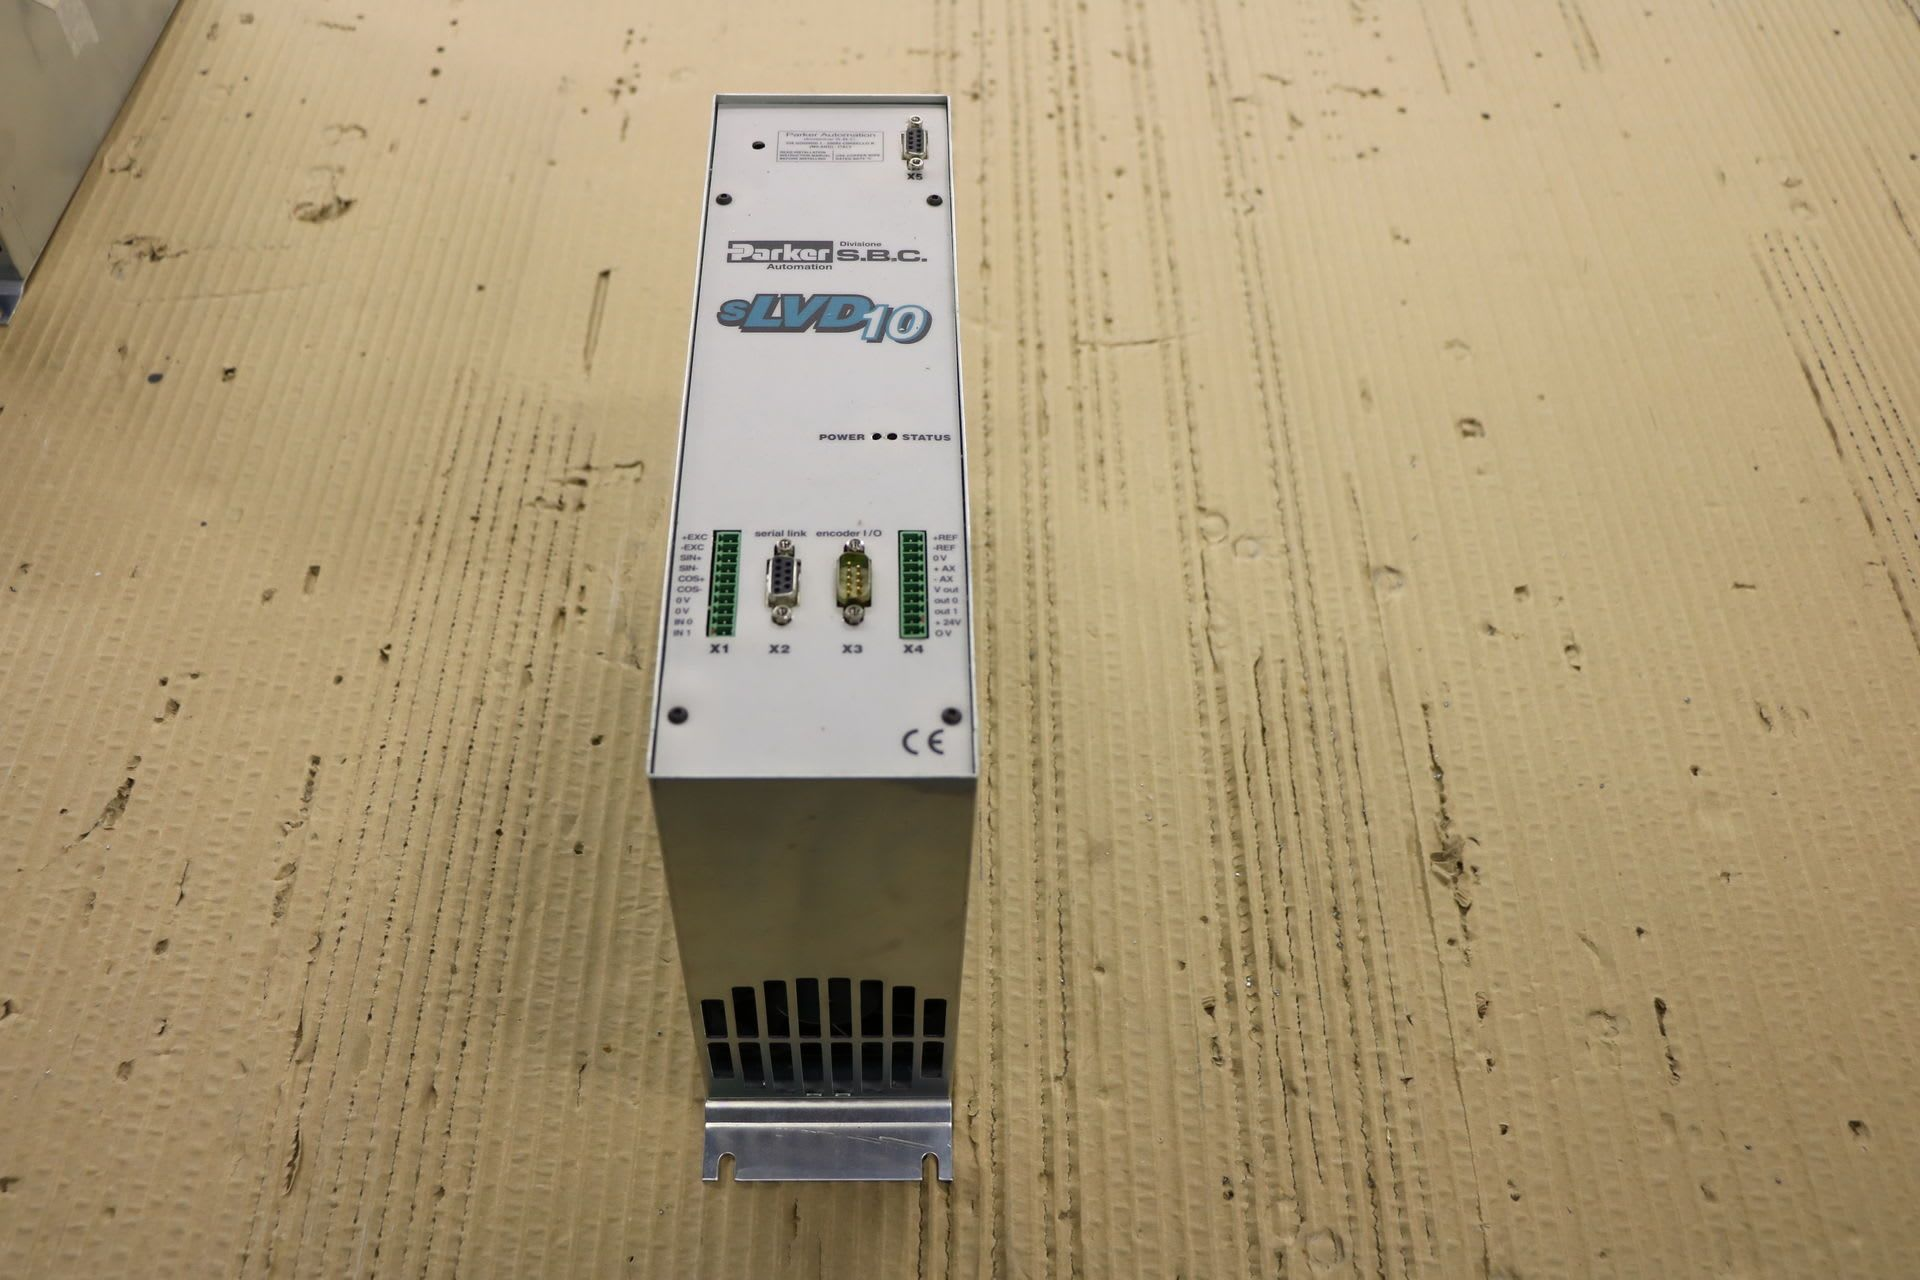 SLVD 10 Servo-Antrieb